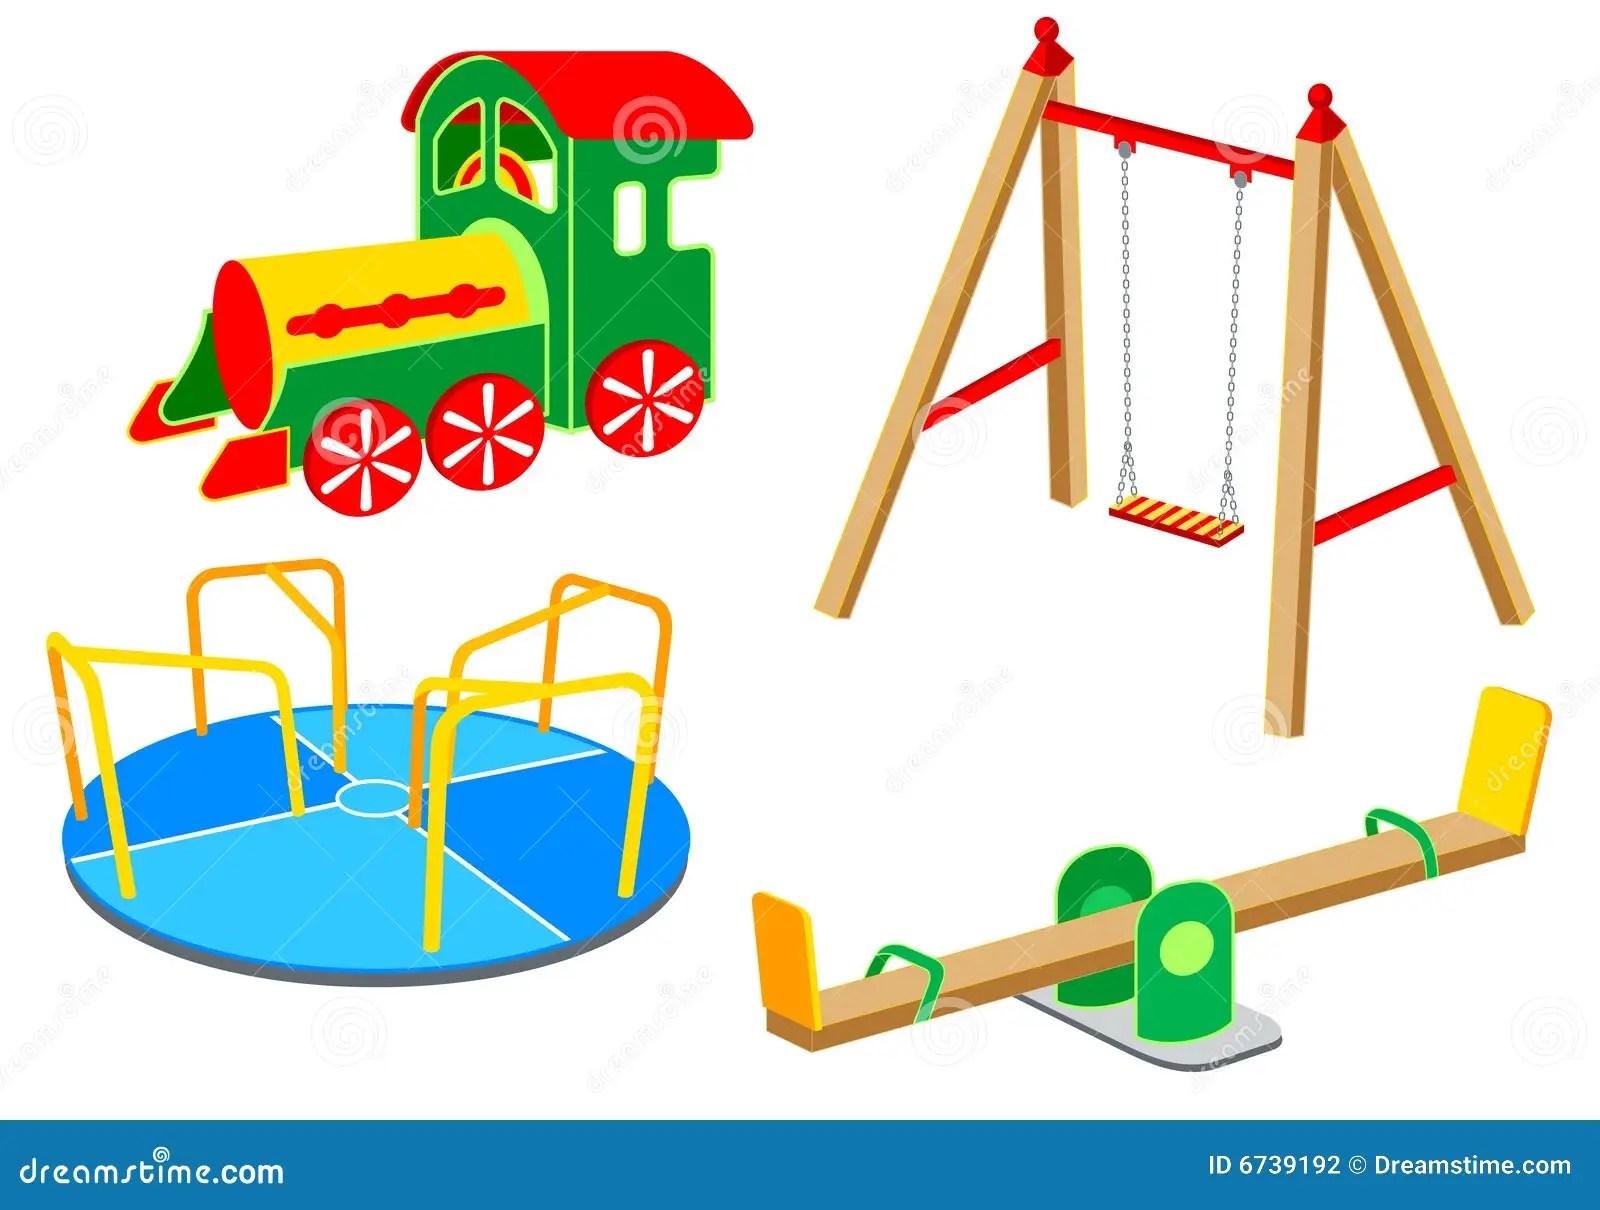 Playground Equipment Set 1 Stock Vector